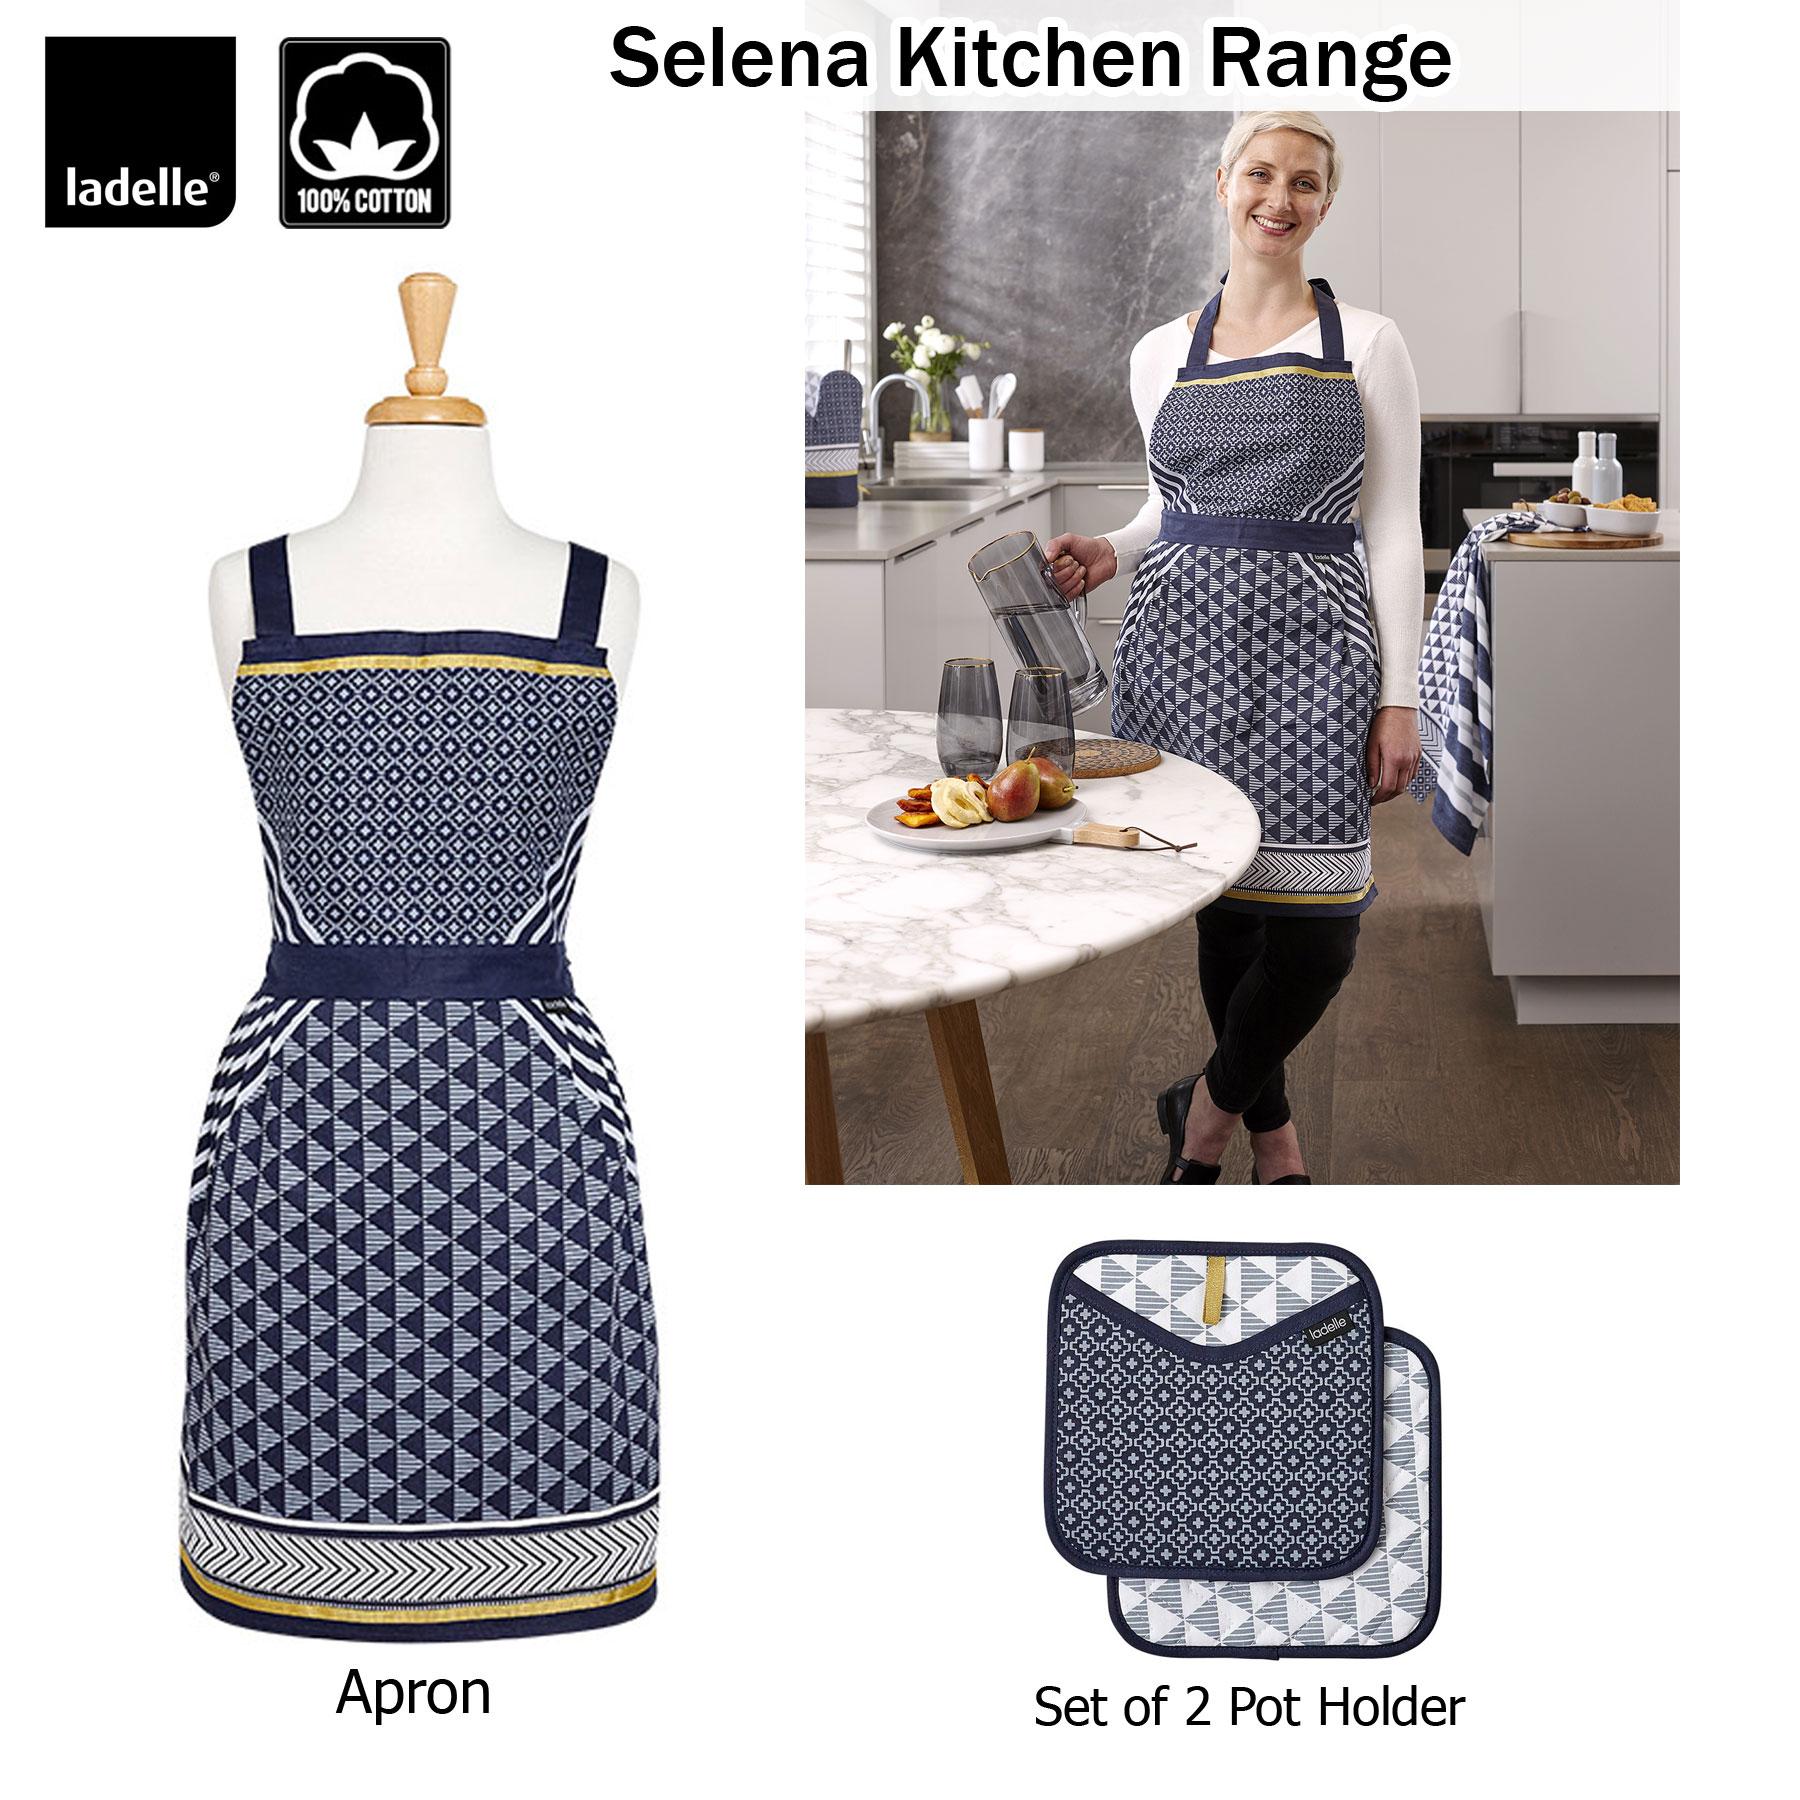 Tea Towel Choice Apron Mitten Bake Me Happy Cotton Kitchen Range by Ladelle